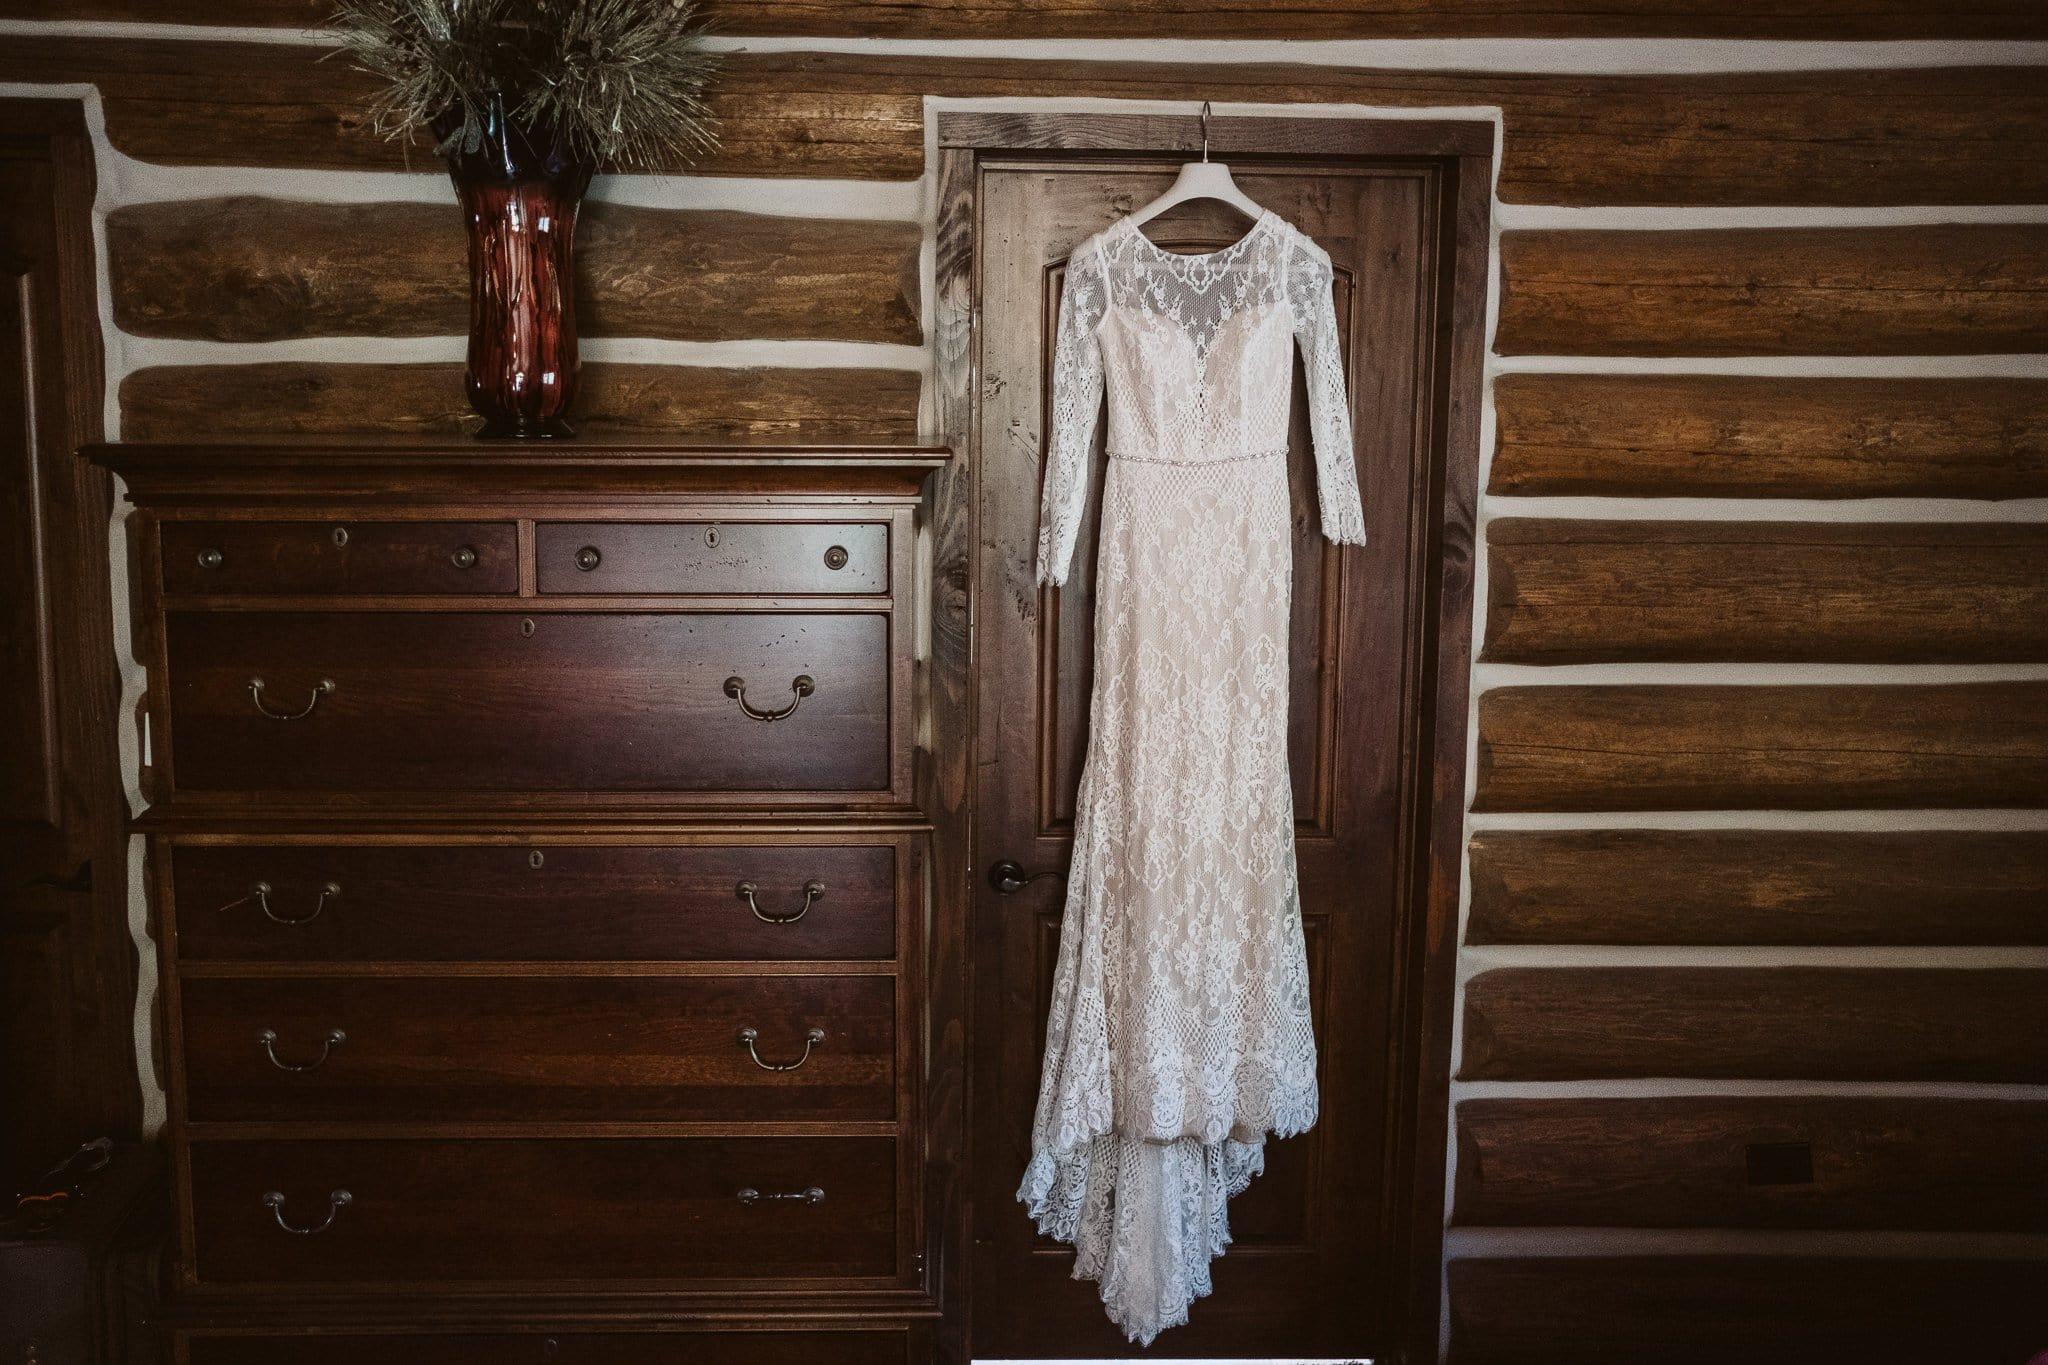 Ortiva wedding dress from White One by Pronovias, long sleeve elegant wedding dress